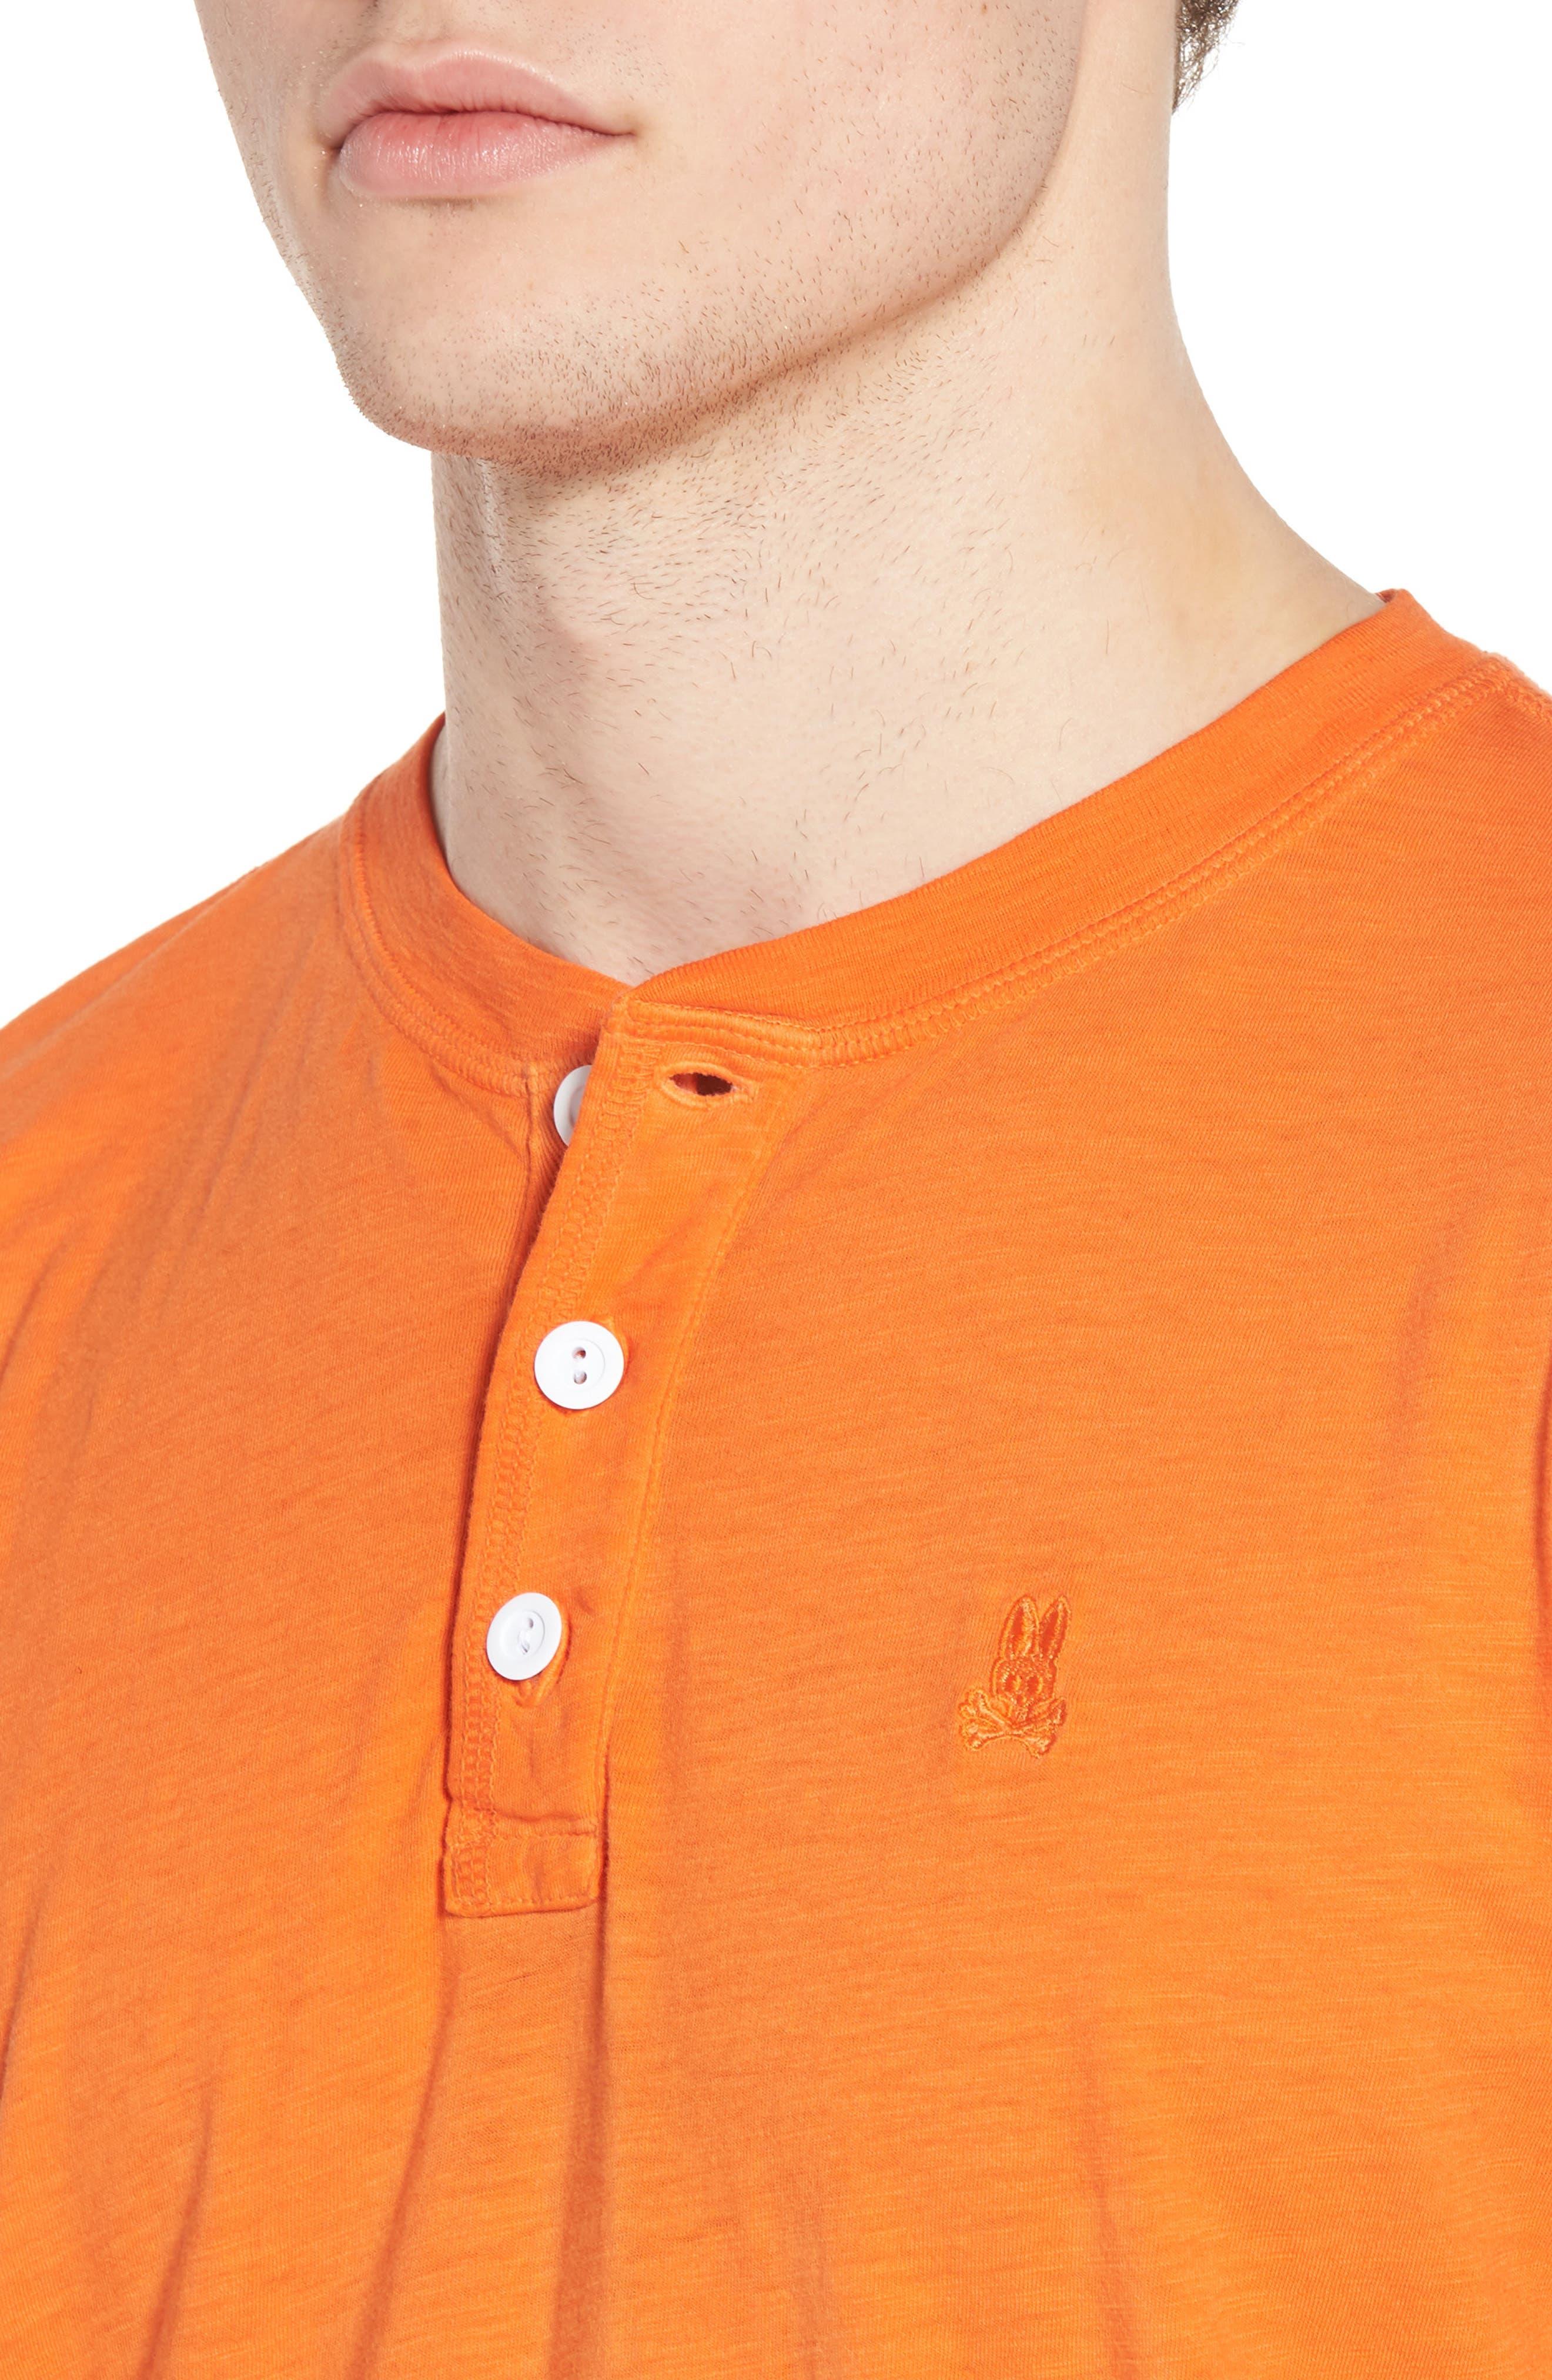 Sunwash Henley T-Shirt,                             Alternate thumbnail 20, color,